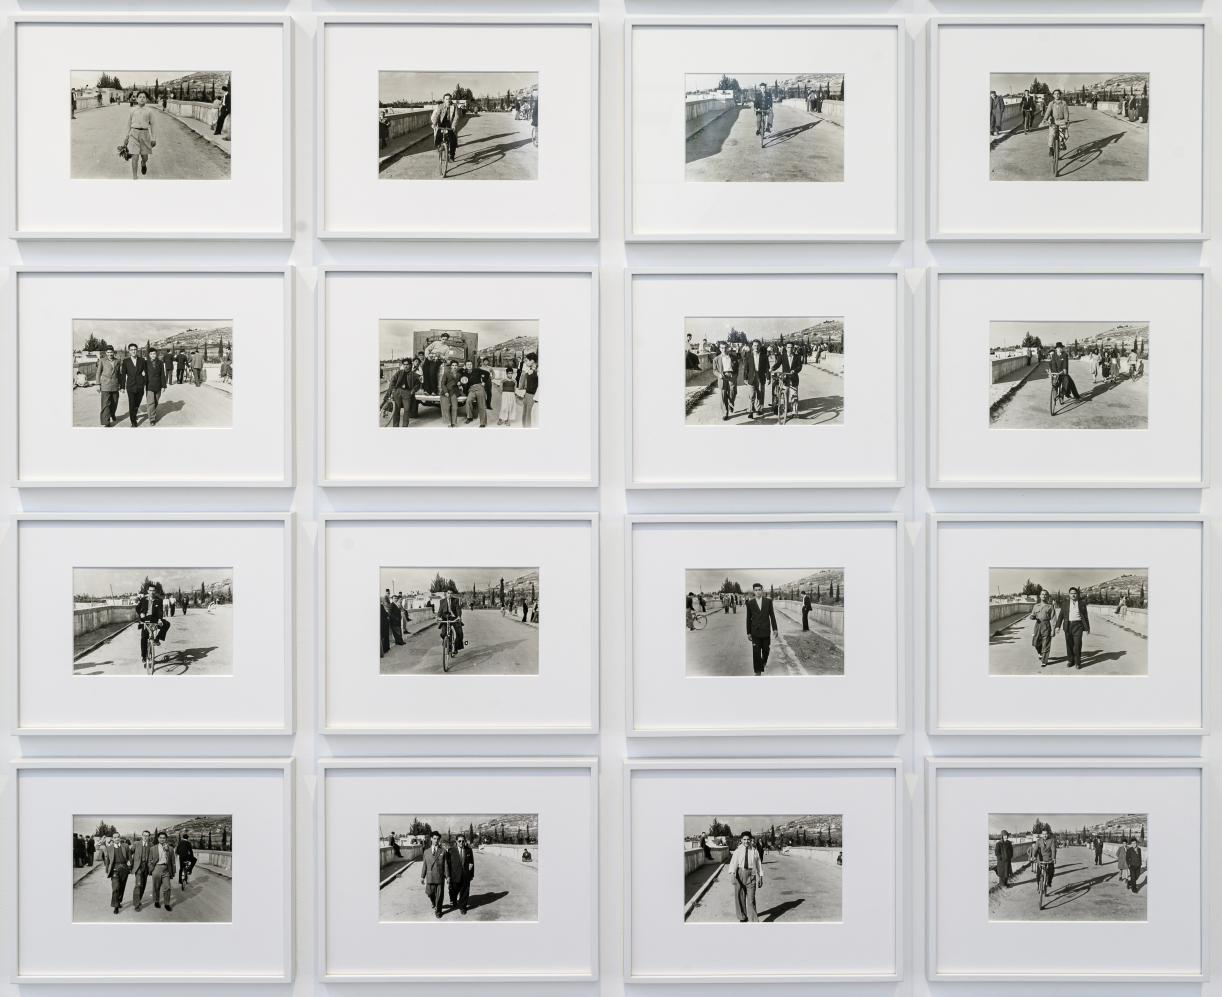 60 Men Crossing Ain El Helweh Bridge, 2007, 36 black and white silver gelatin prints. From the archive of Hashem El Madani, Studio Sheherzade, Saida, 22 x 15 cm each